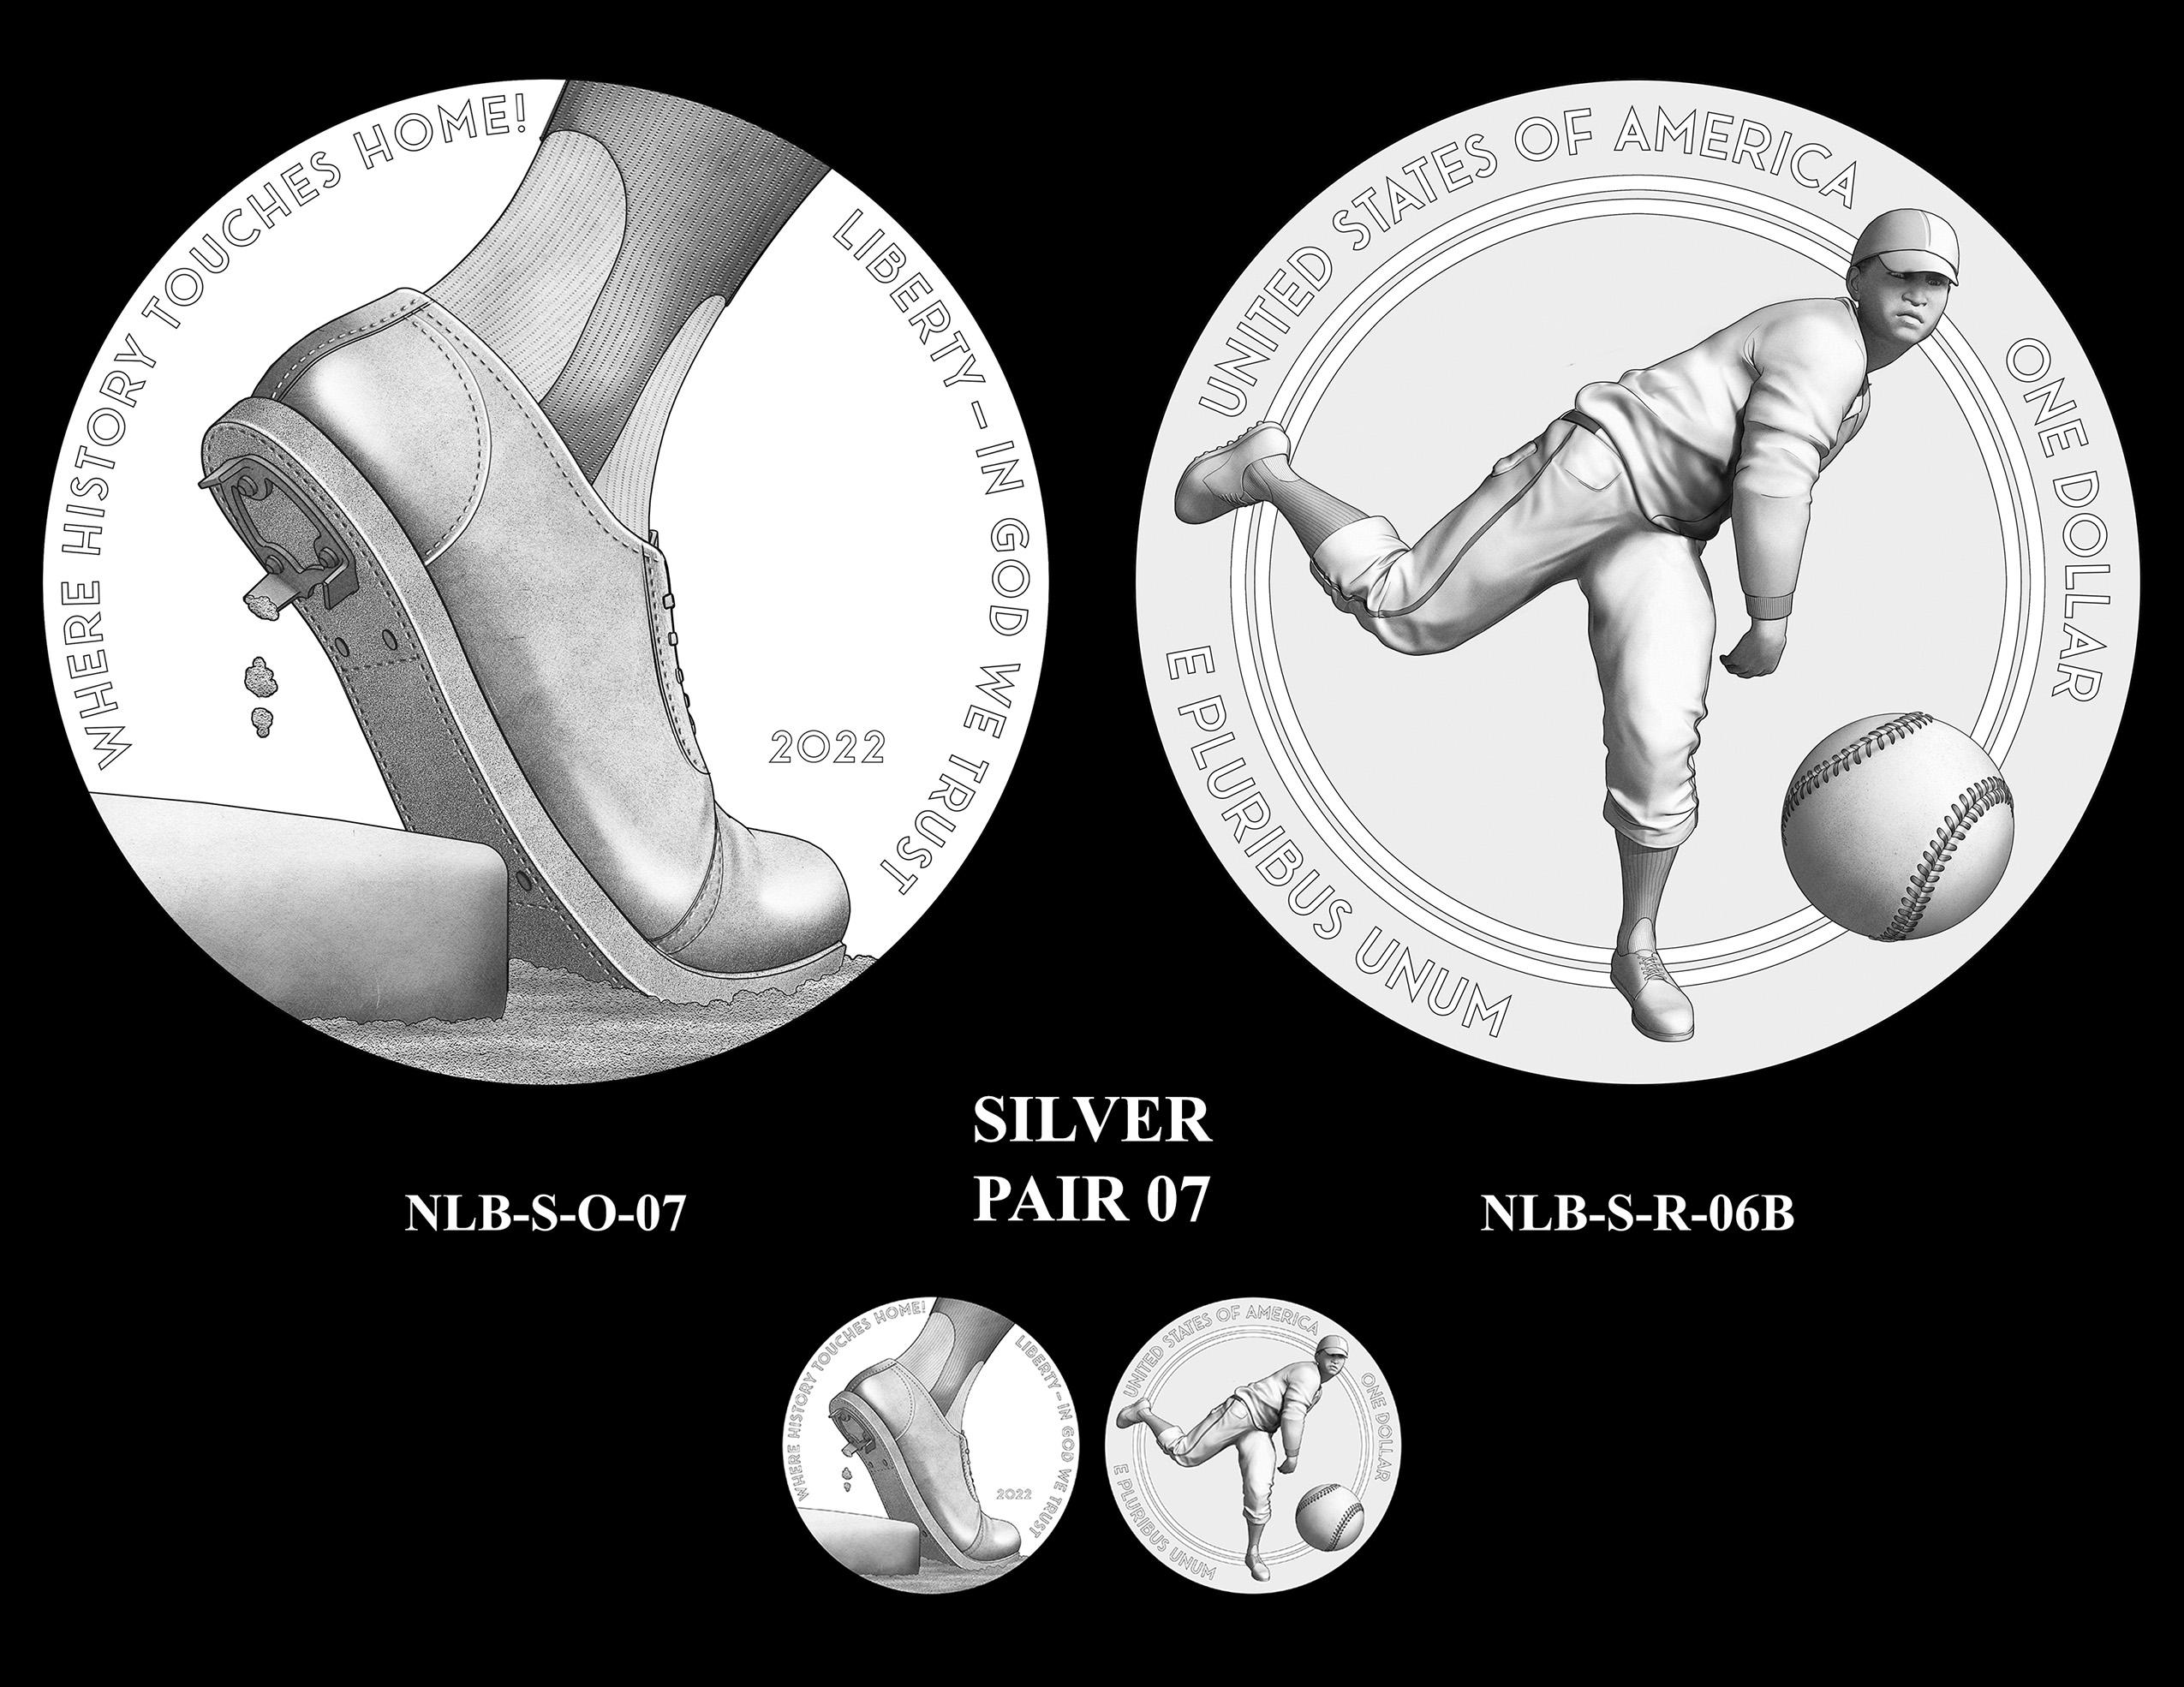 Silver Pair 07 -- Negro Leagues Baseball Commemorative Coin Program